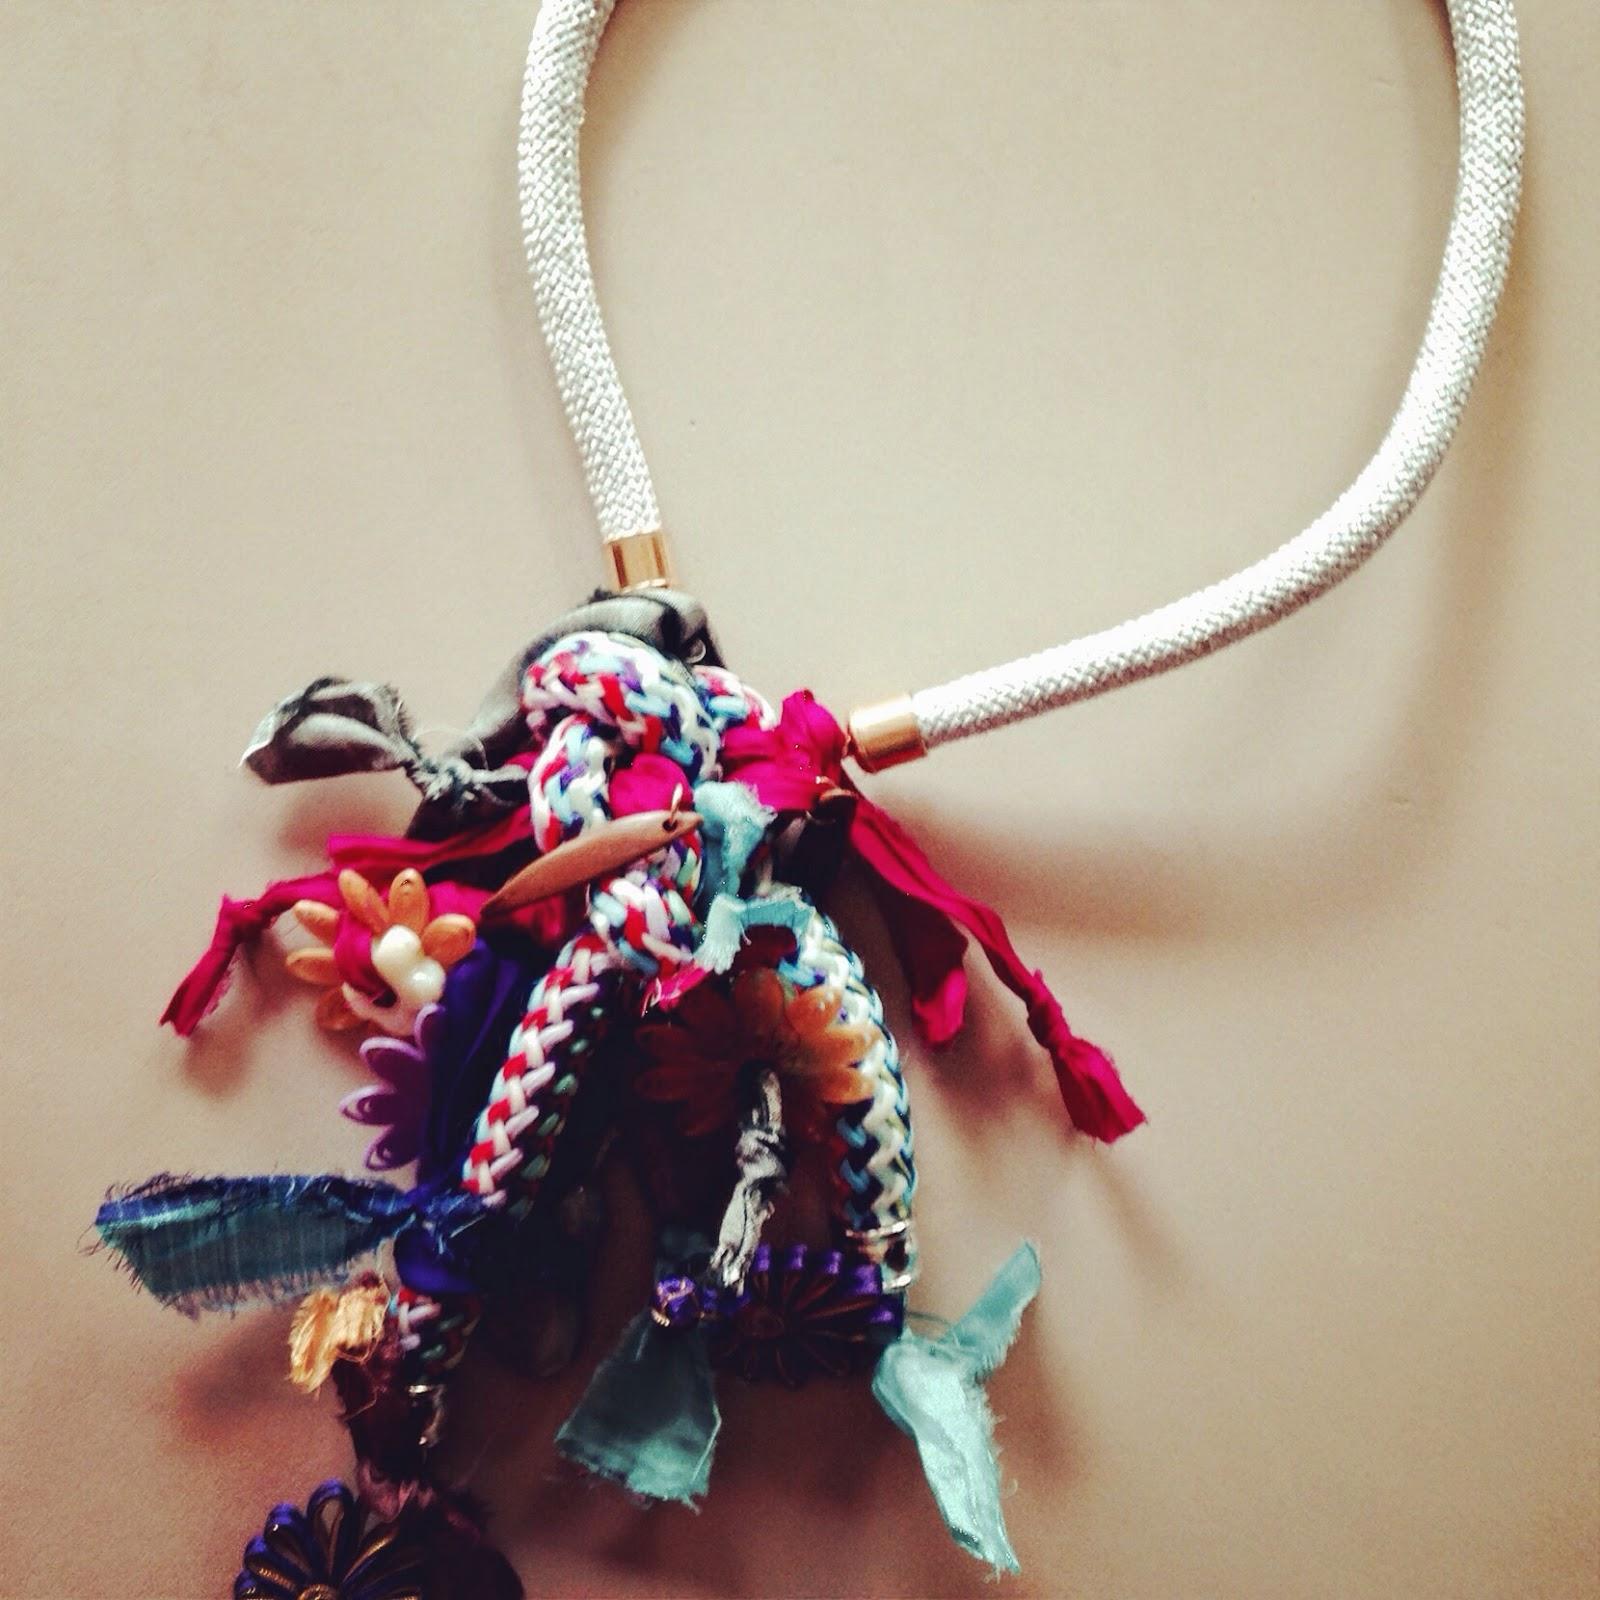 the unike jewelry